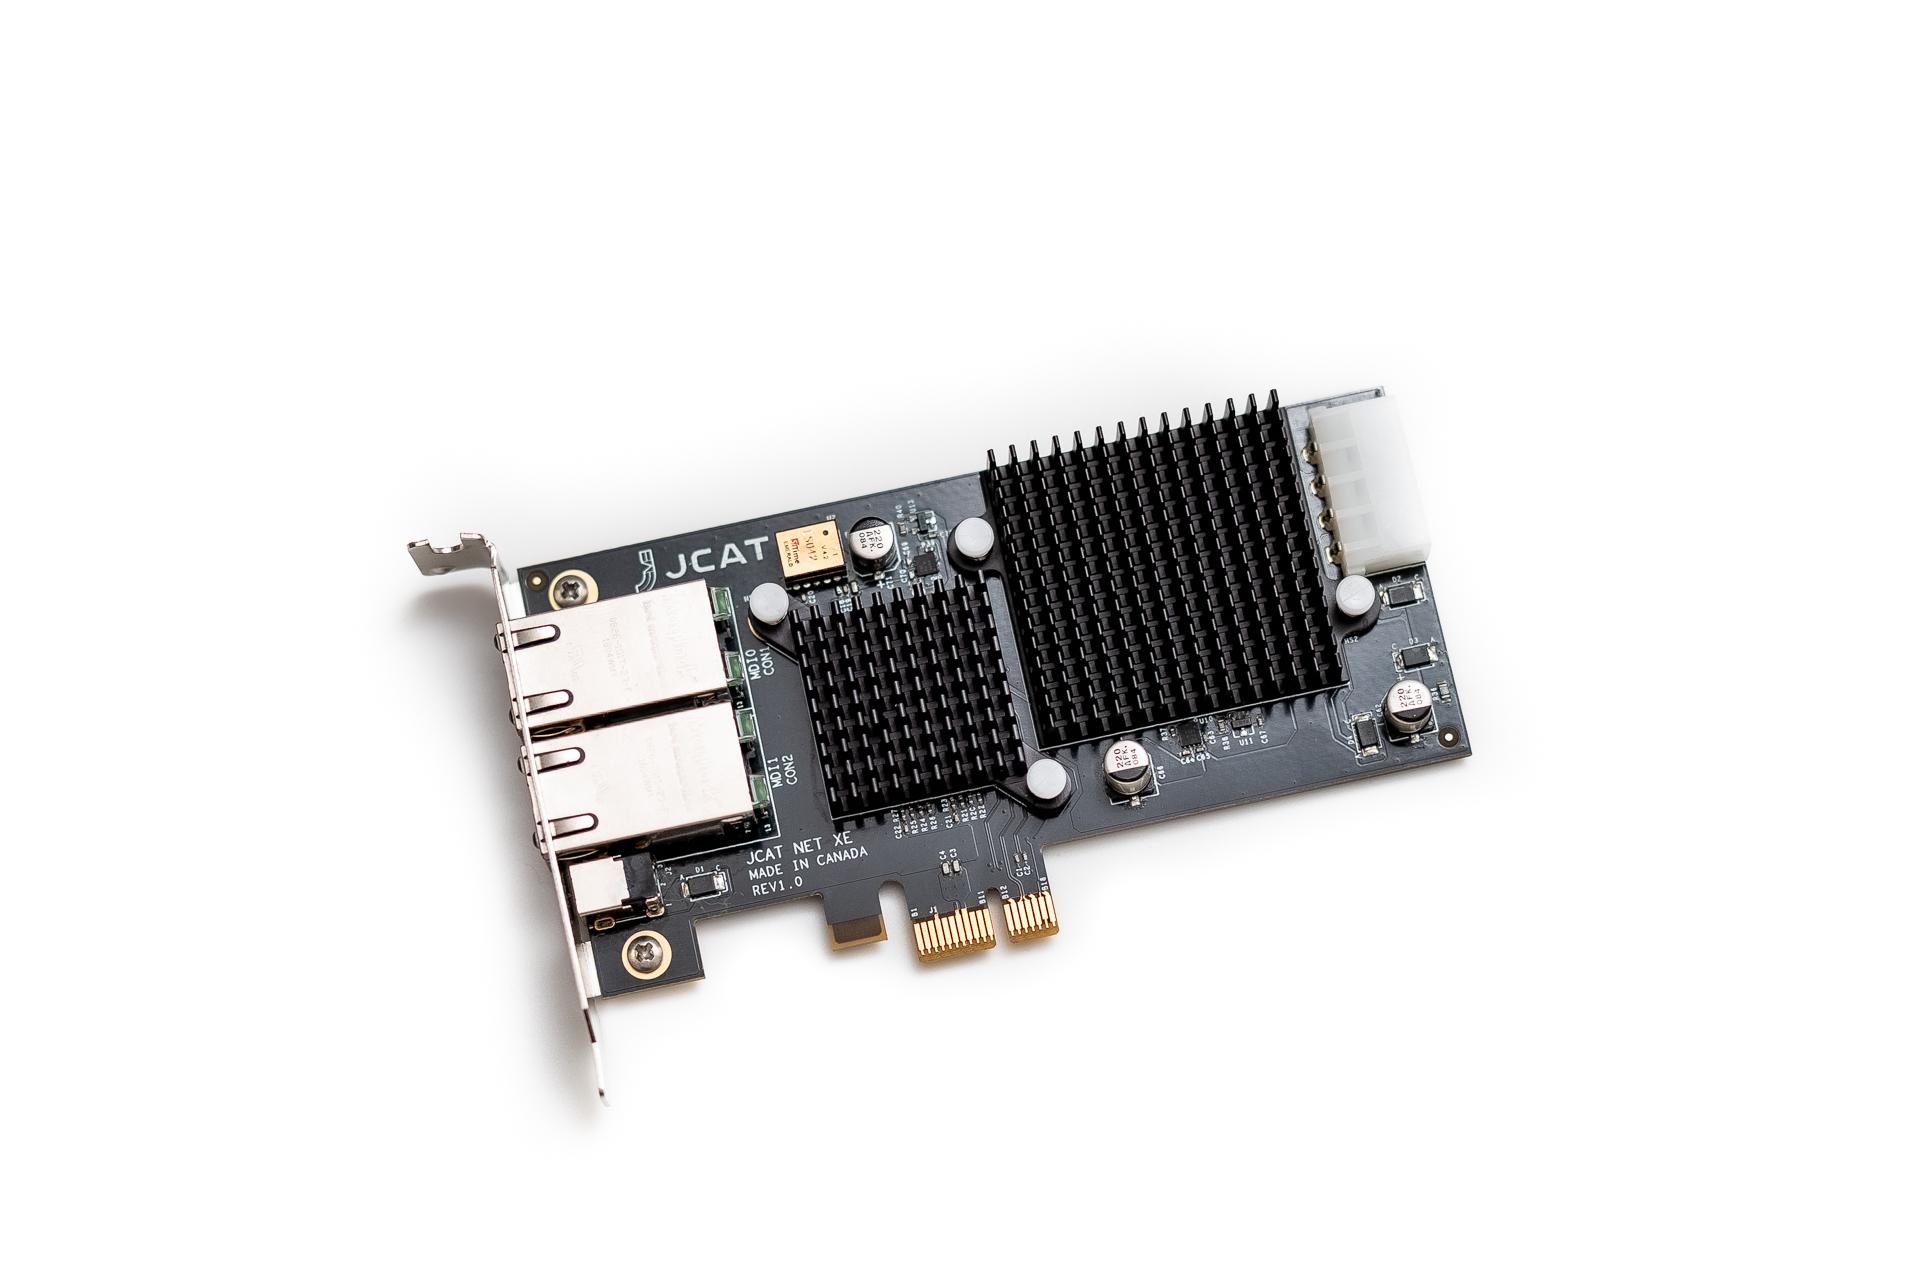 NET CARD XE hifi network card